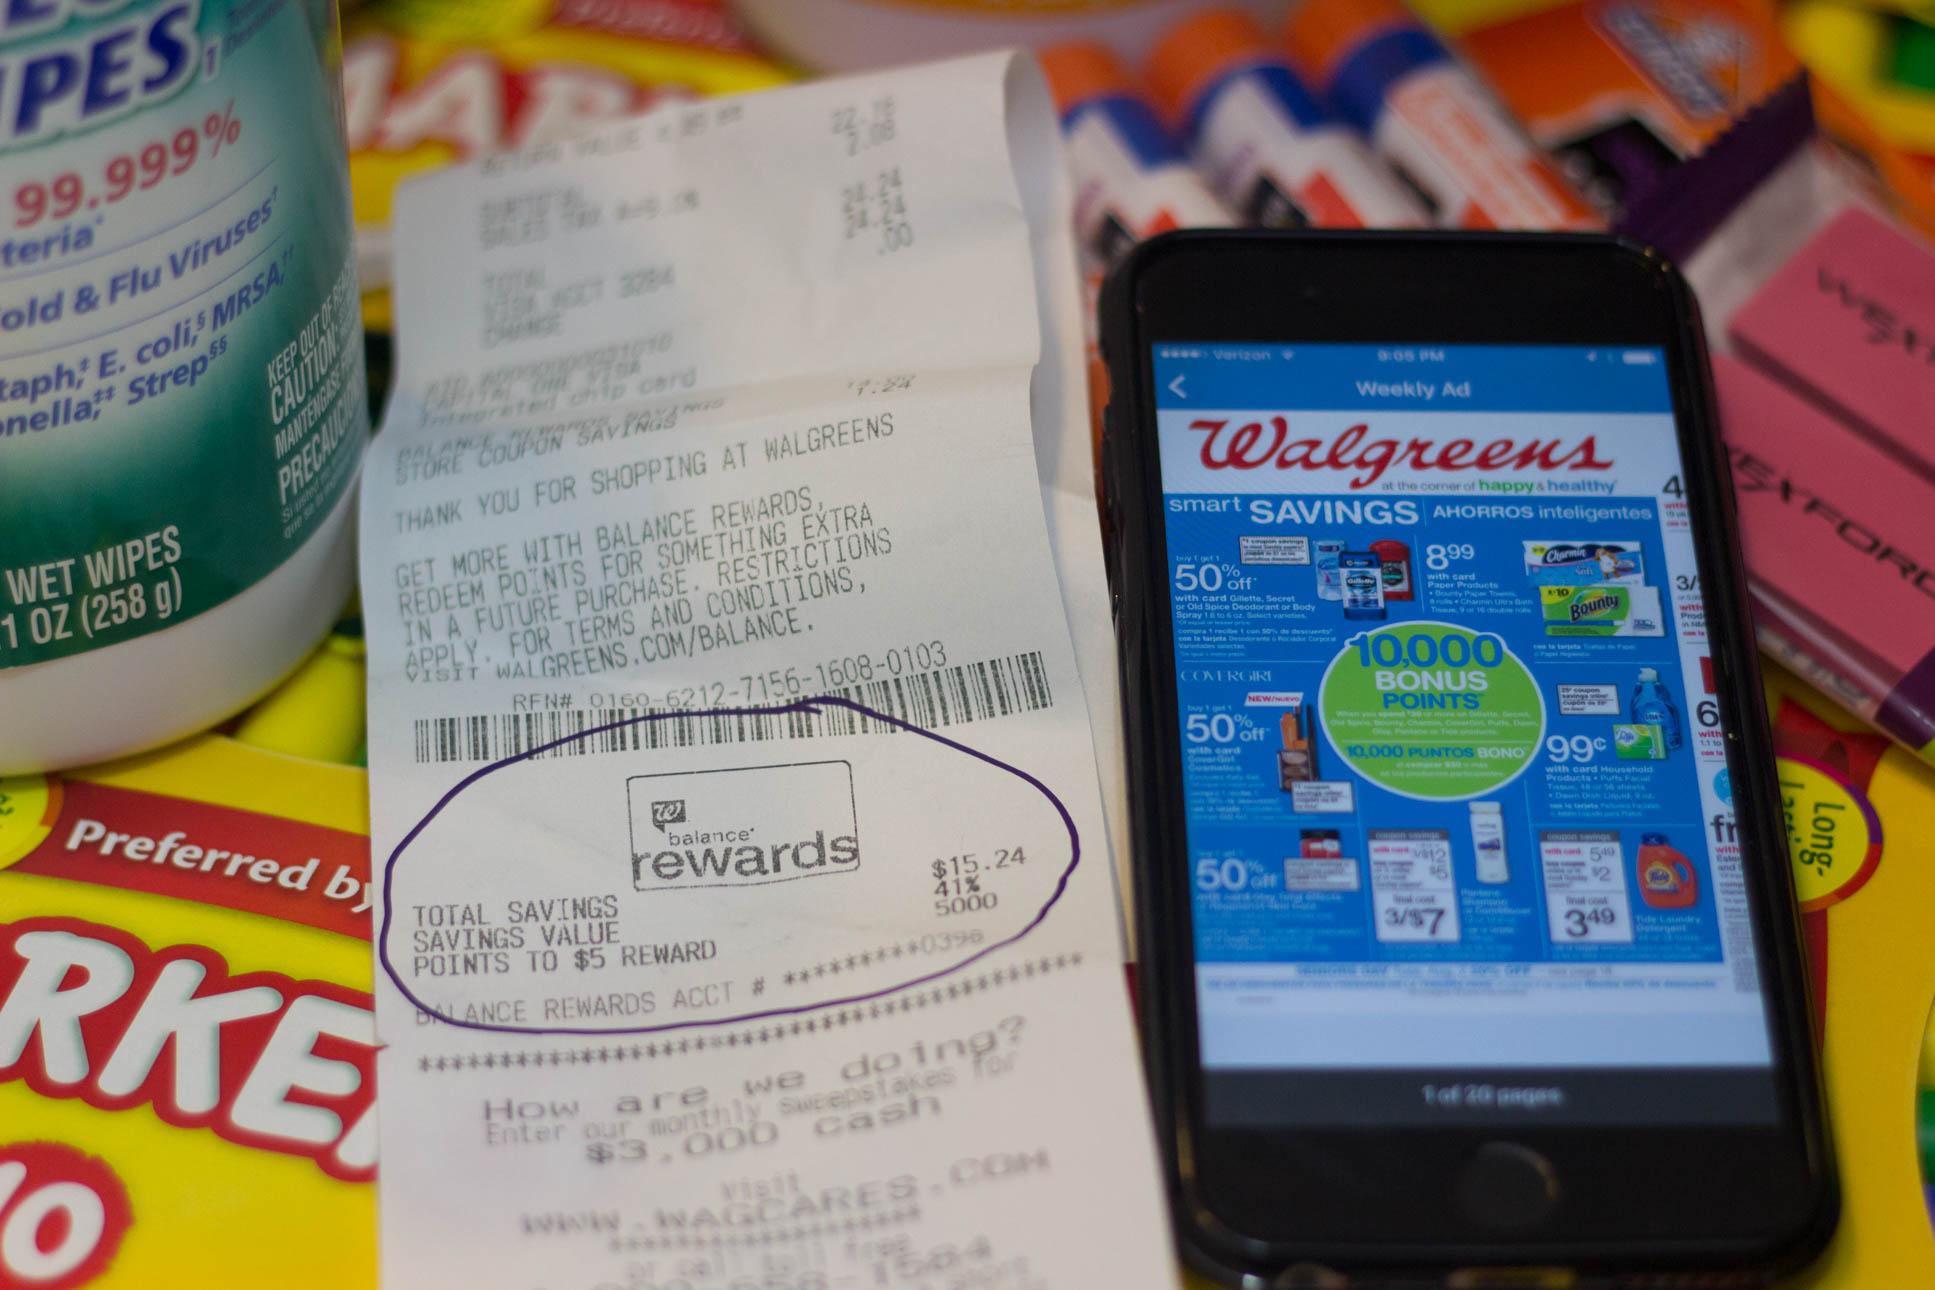 Walgreens photo mobile app - Thompson vacations